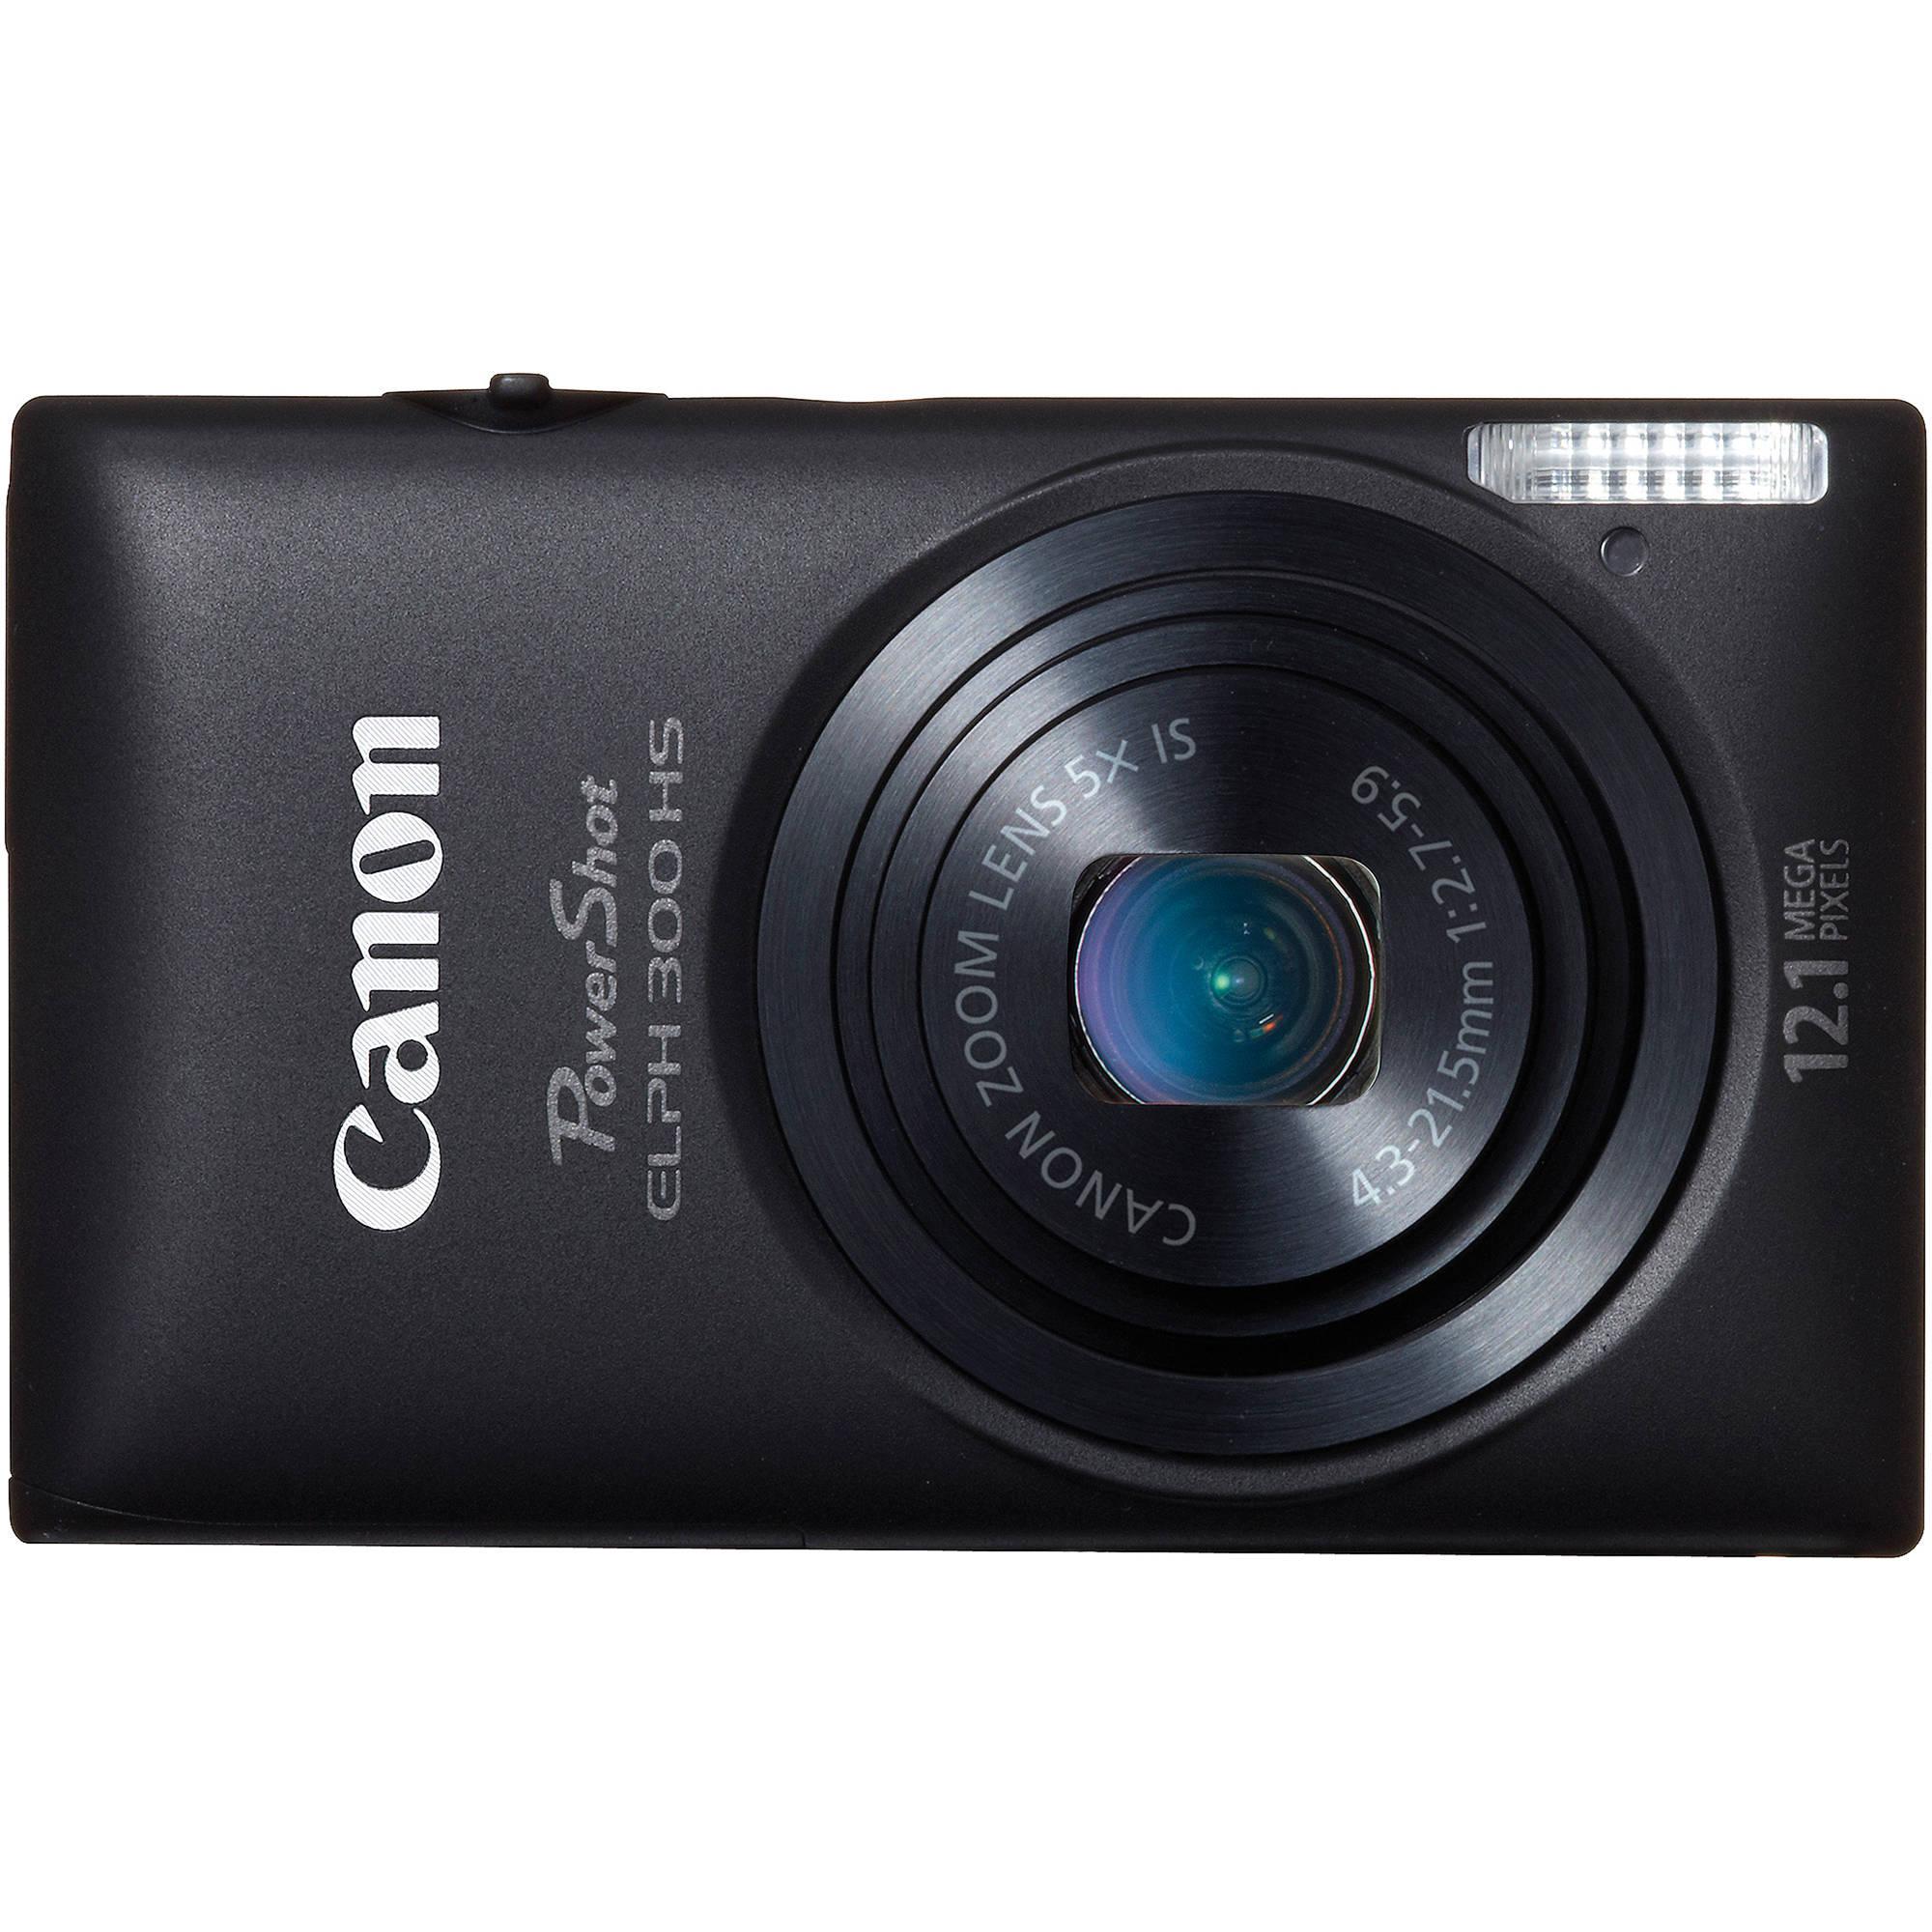 canon powershot 300 hs digital elph camera black 5096b001 b h rh bhphotovideo com canon elph 300 hs user manual canon elph 300 hs manual pdf